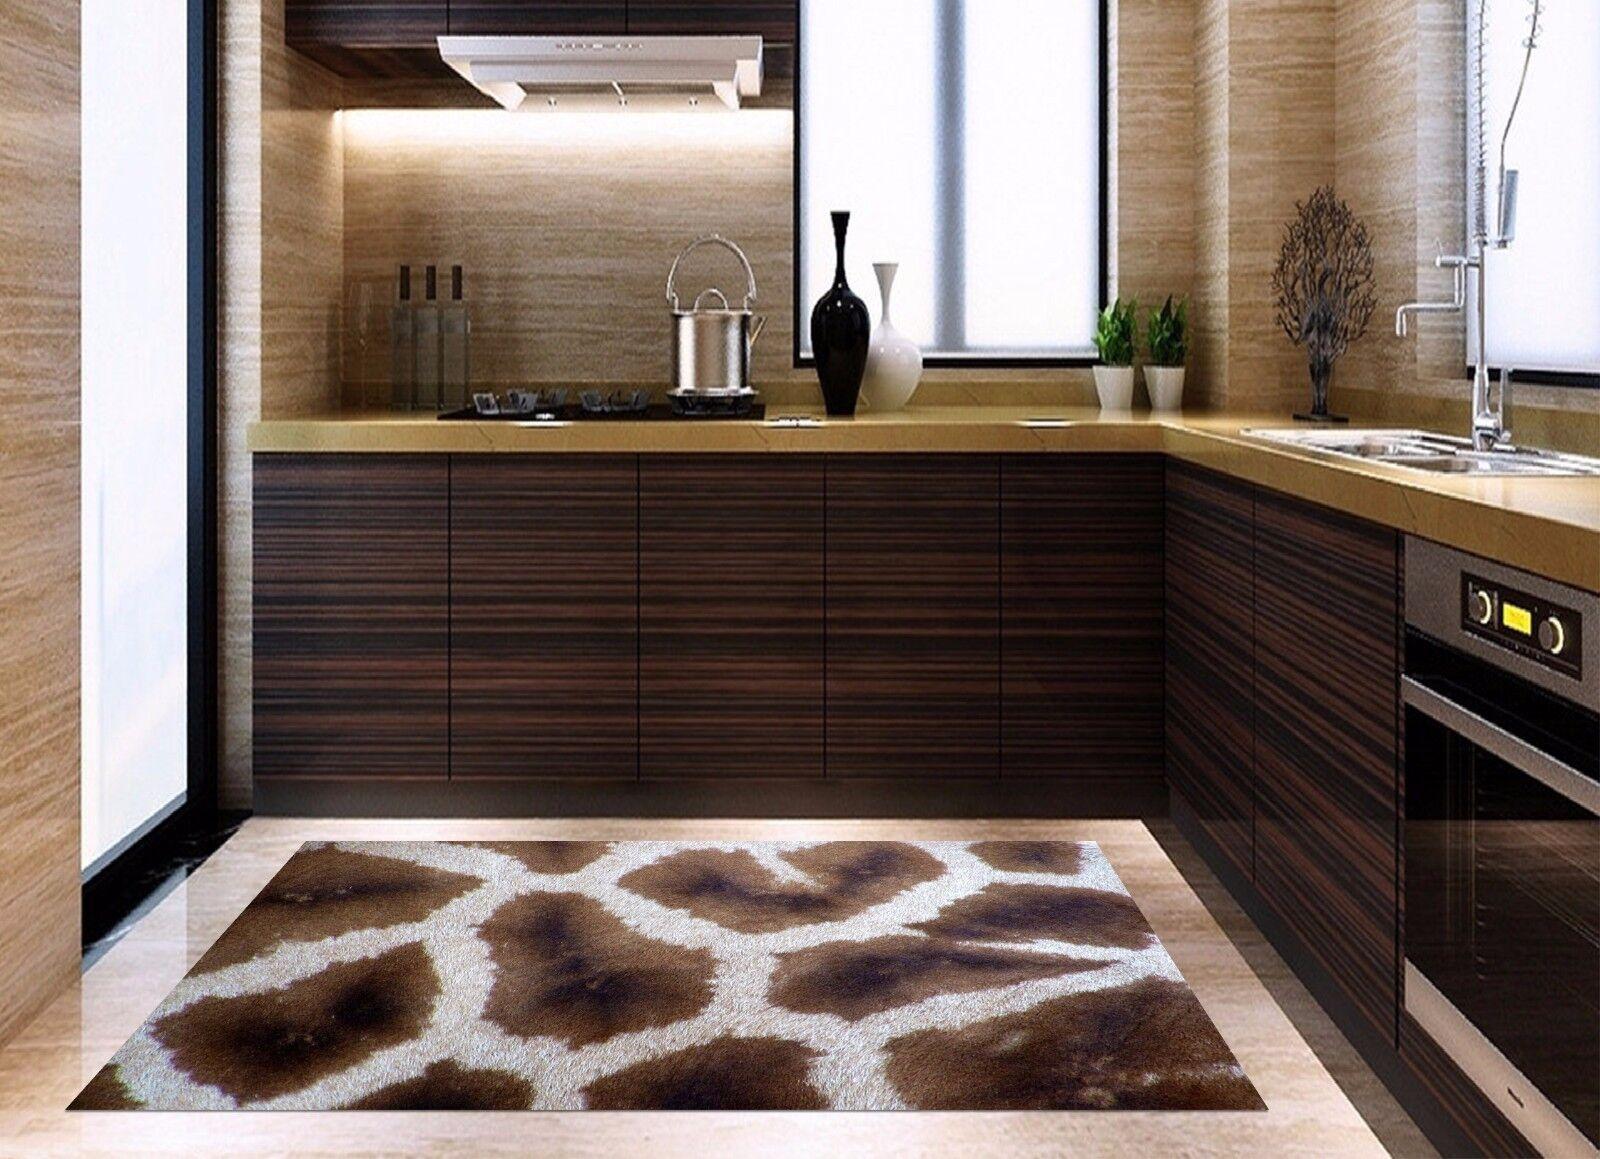 3D Leopard 883 Kitchen Mat Floor Murals Wall Print Wall Deco UK Carly